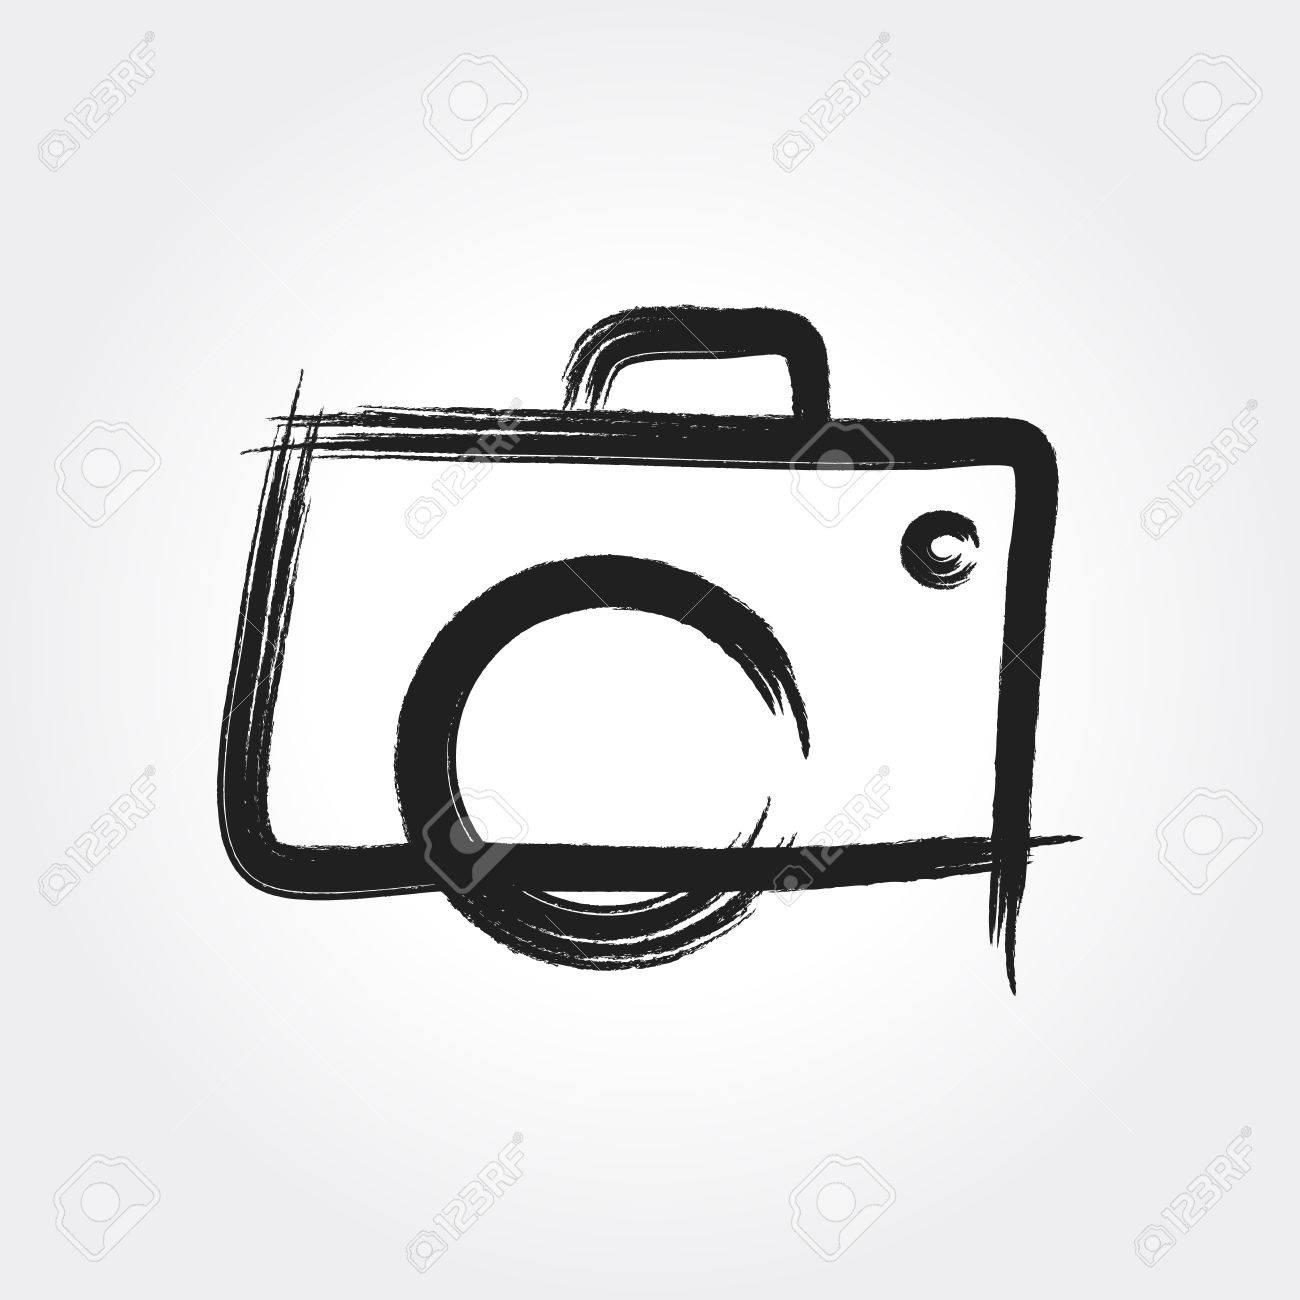 Hand Drawn Camera Photography Royalty Free Cliparts Vectors And